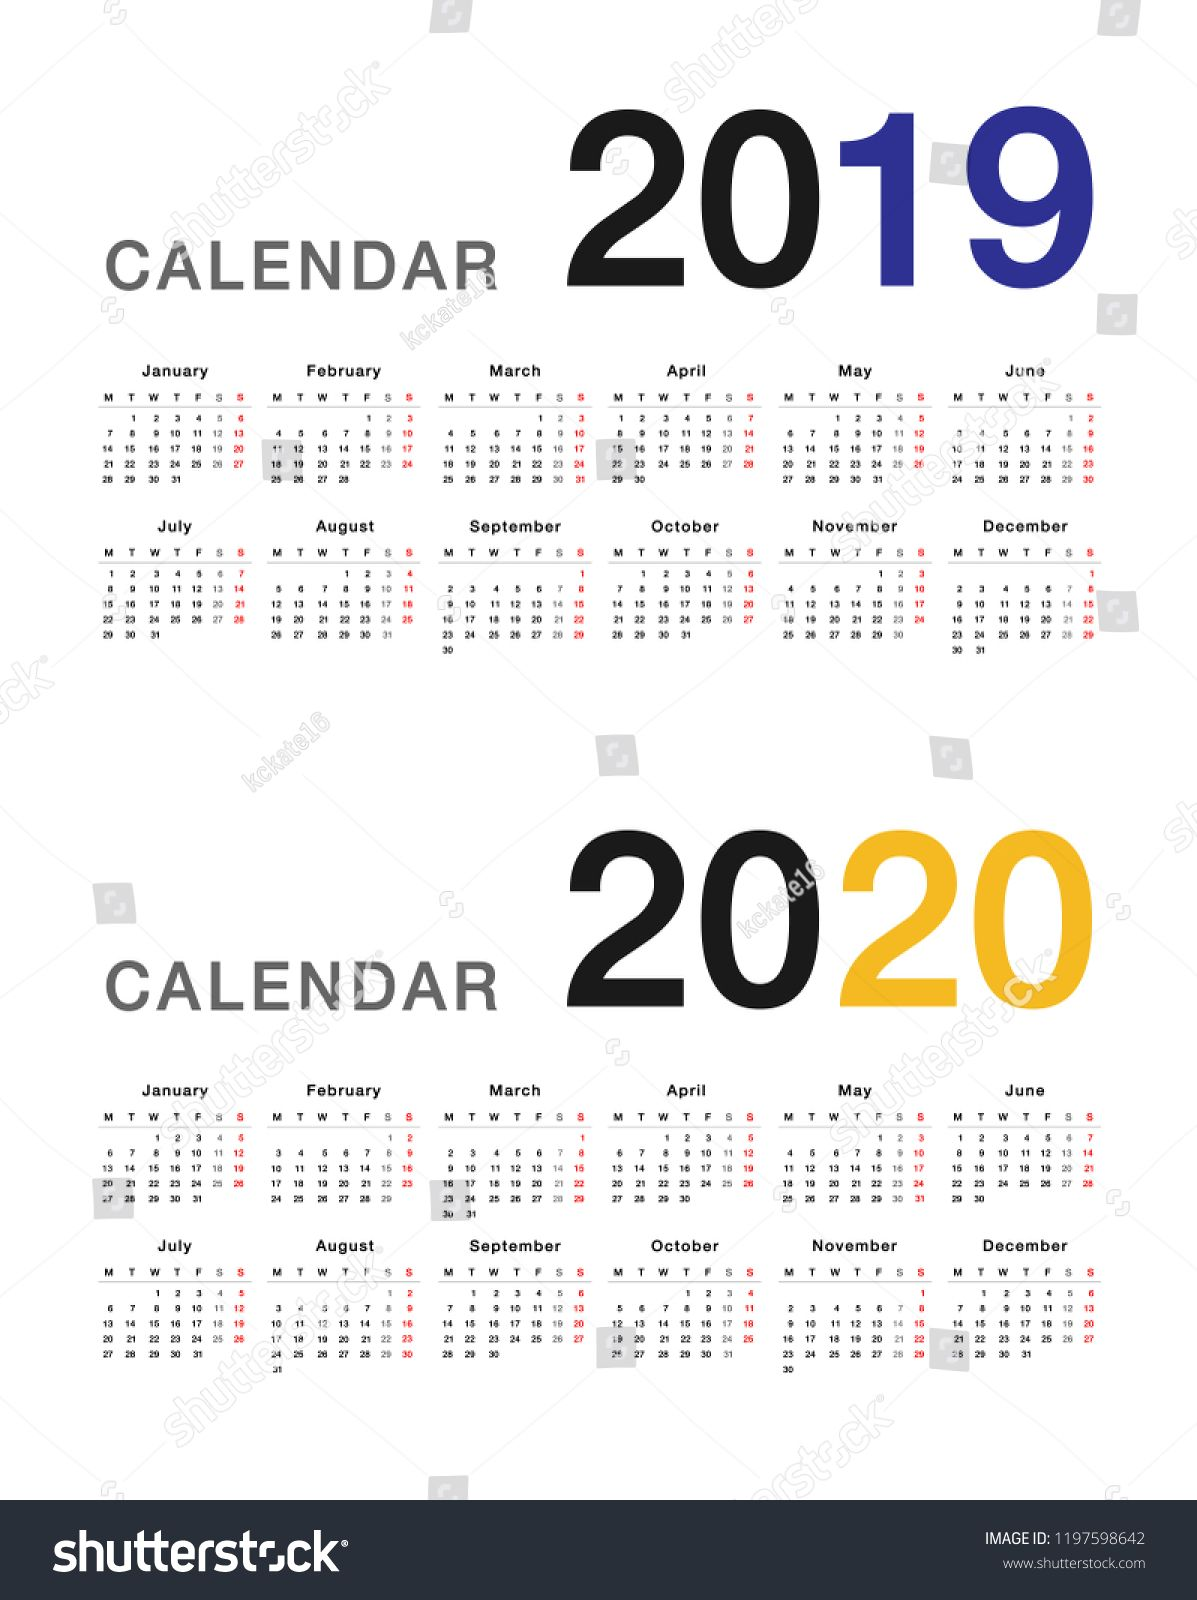 Year 2019 And Year 2020 Calendar Horizontal Vector Design Template